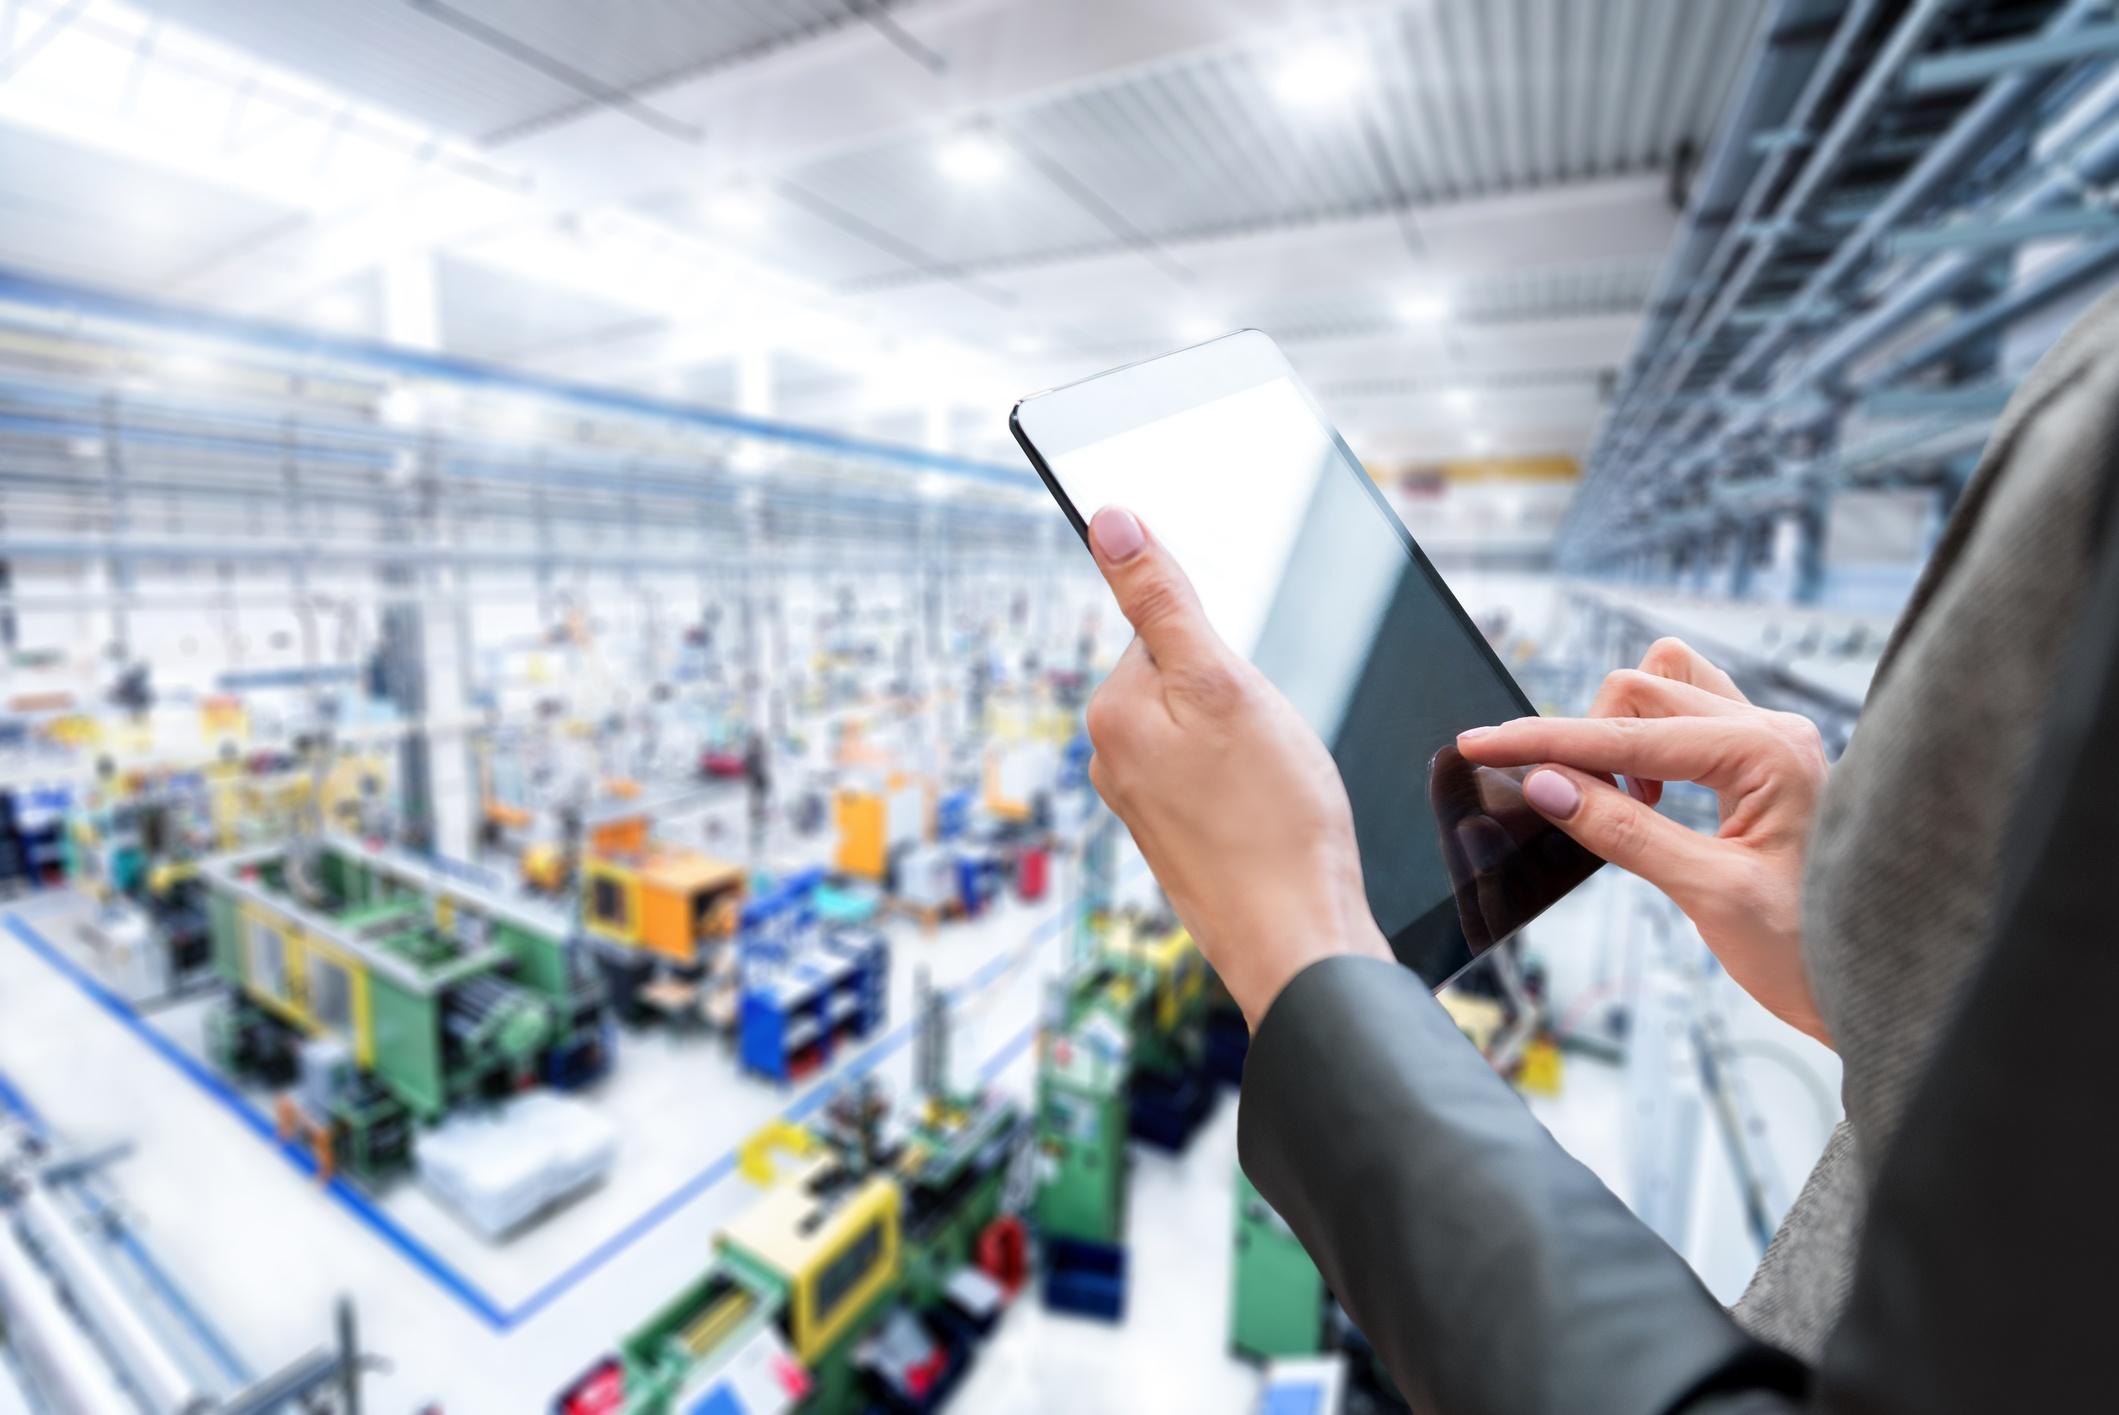 digital supply chain management